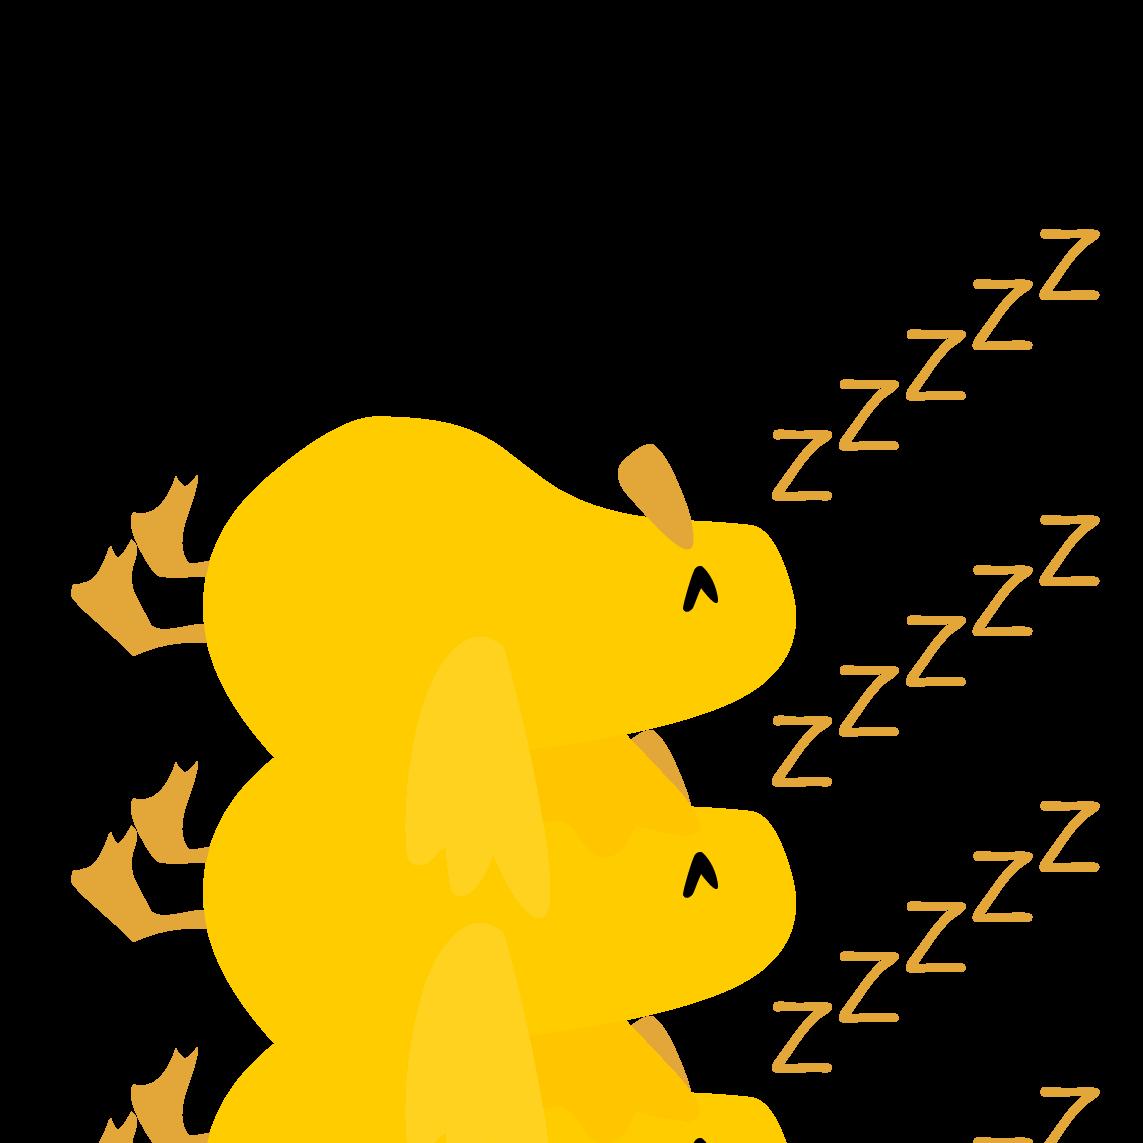 Supplies-bedding-icon-HEN